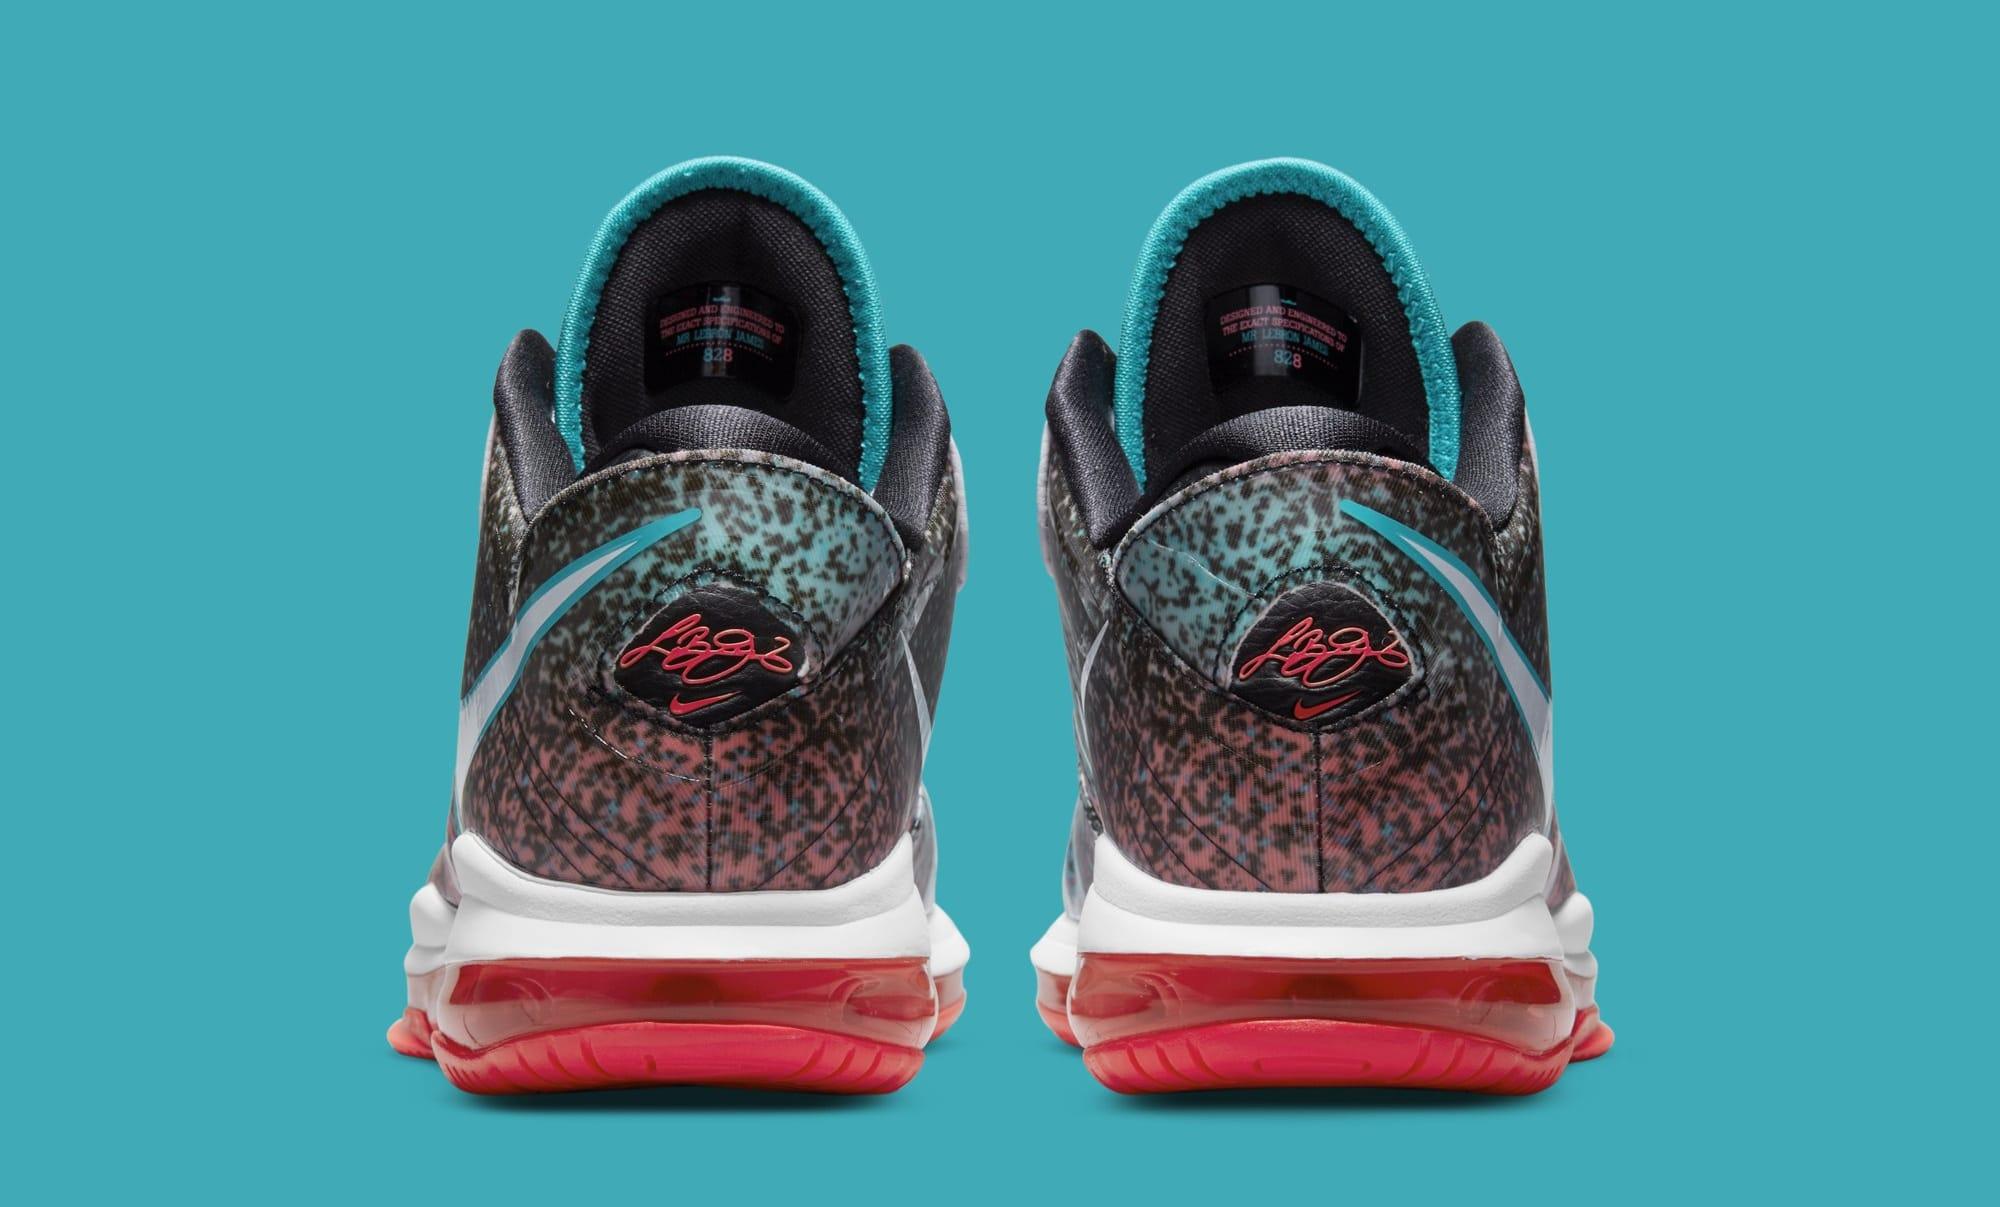 Nike LeBron 8 V2 Low 'Miami Nights' 2021 DJ4436-100 (Heel)